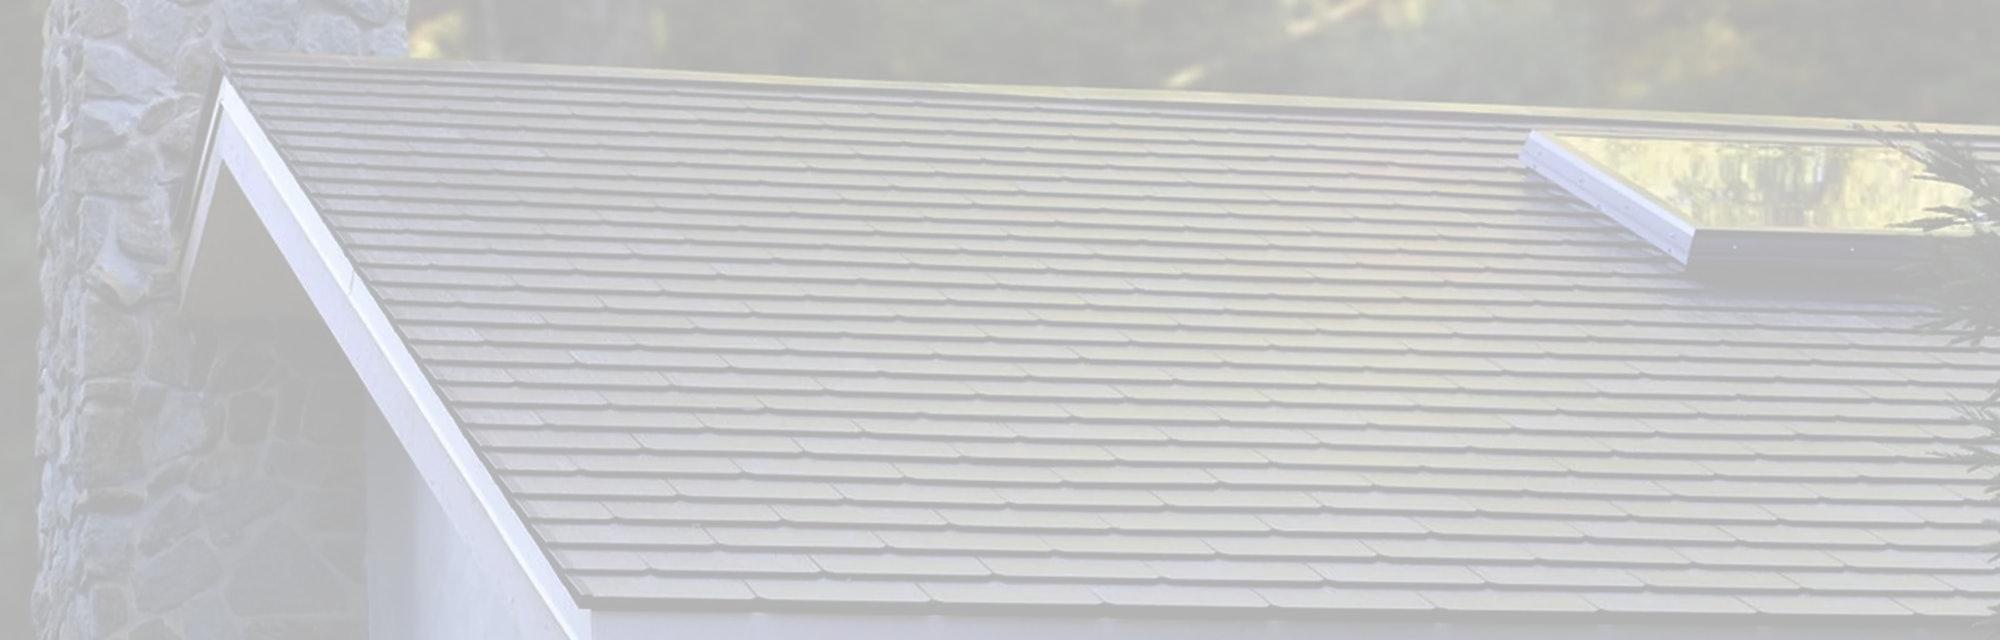 Tesla Solar Roof: Elon Musk Reveals Version 3 Production ...